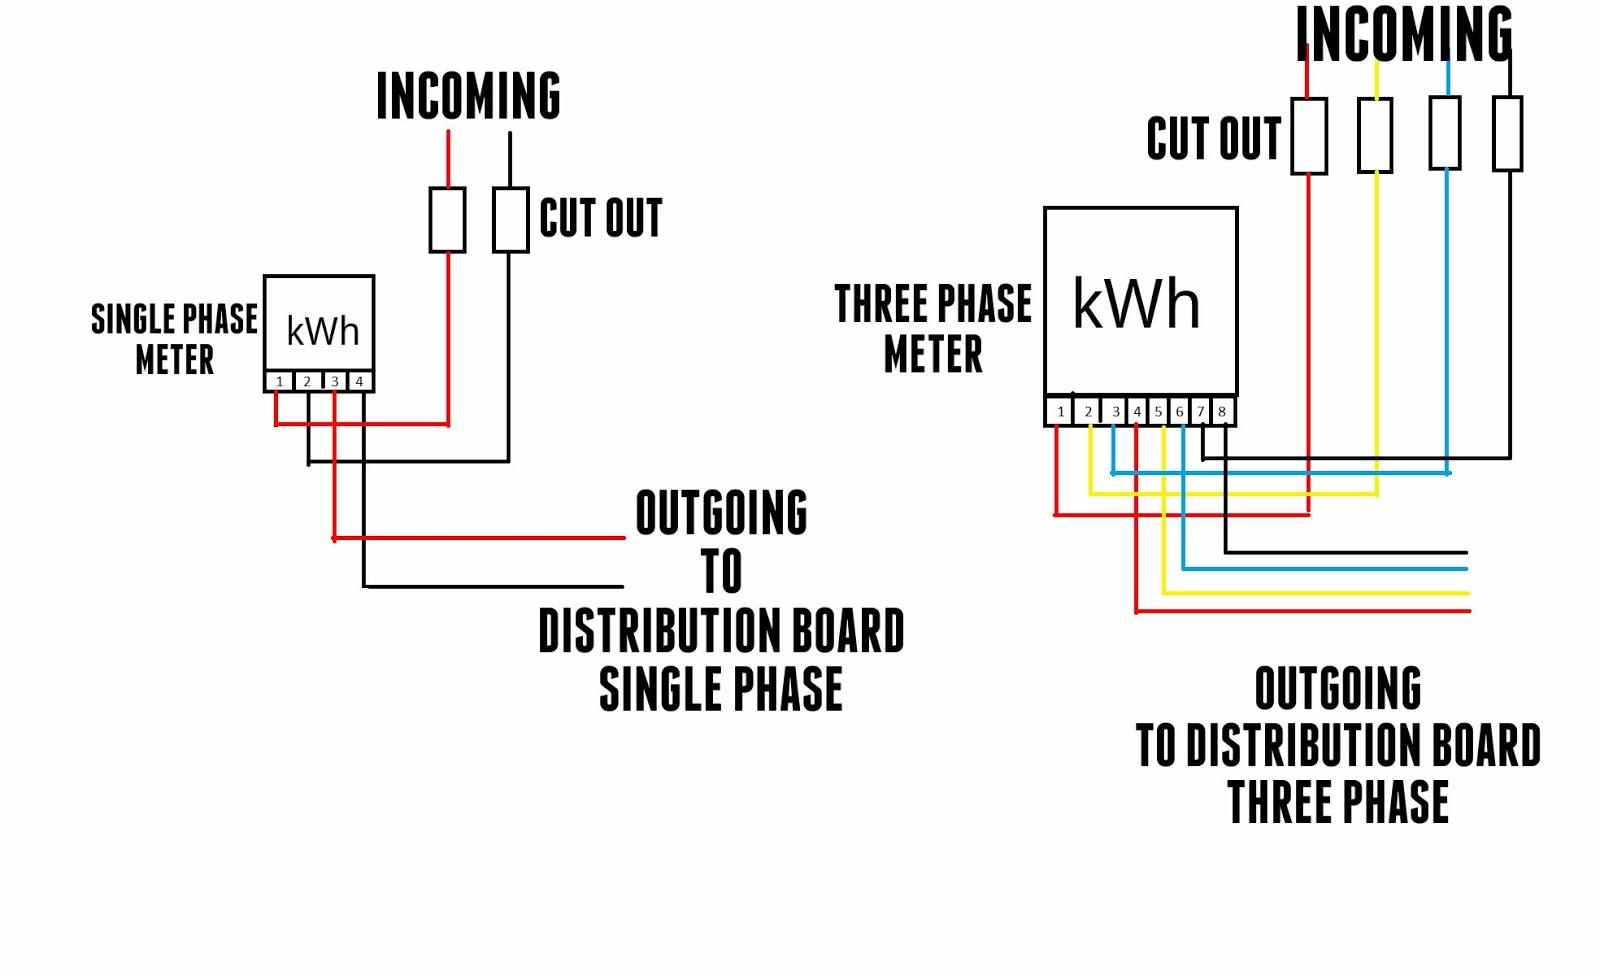 The World Through Electricity: Kilo Watt Hour Meter (kWh